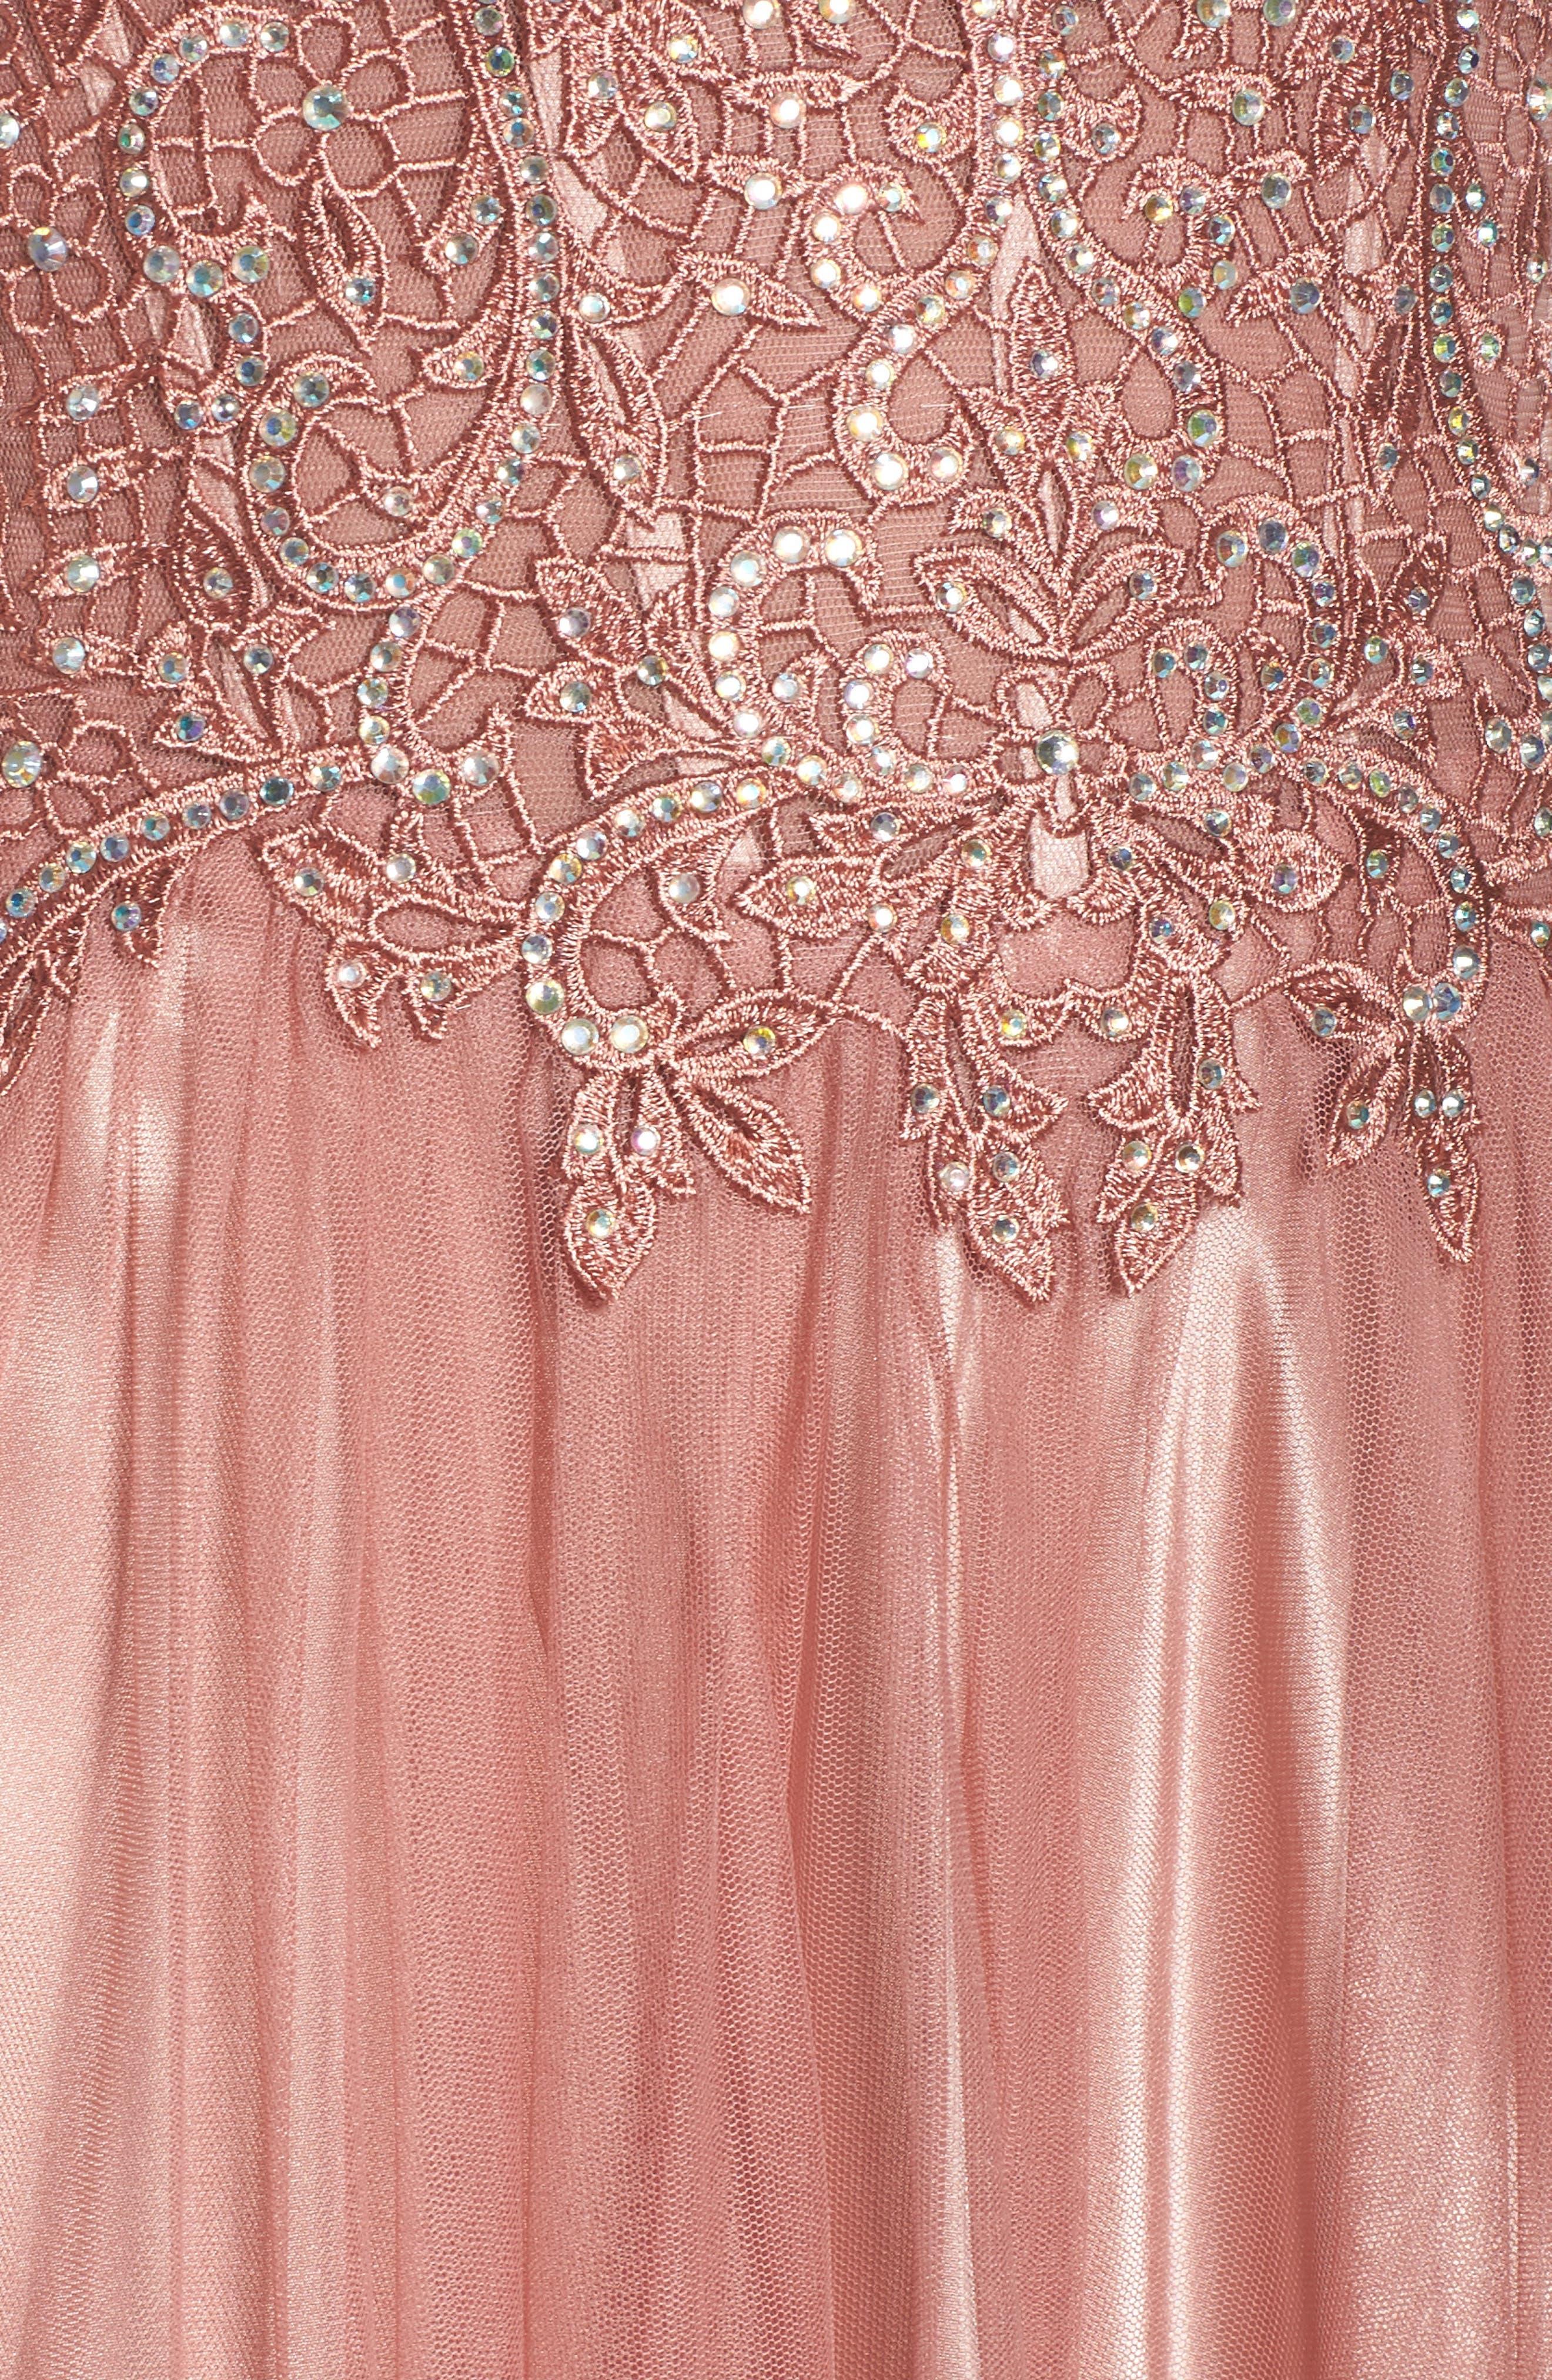 Embellished Corset Ballgown,                             Alternate thumbnail 5, color,                             Rose